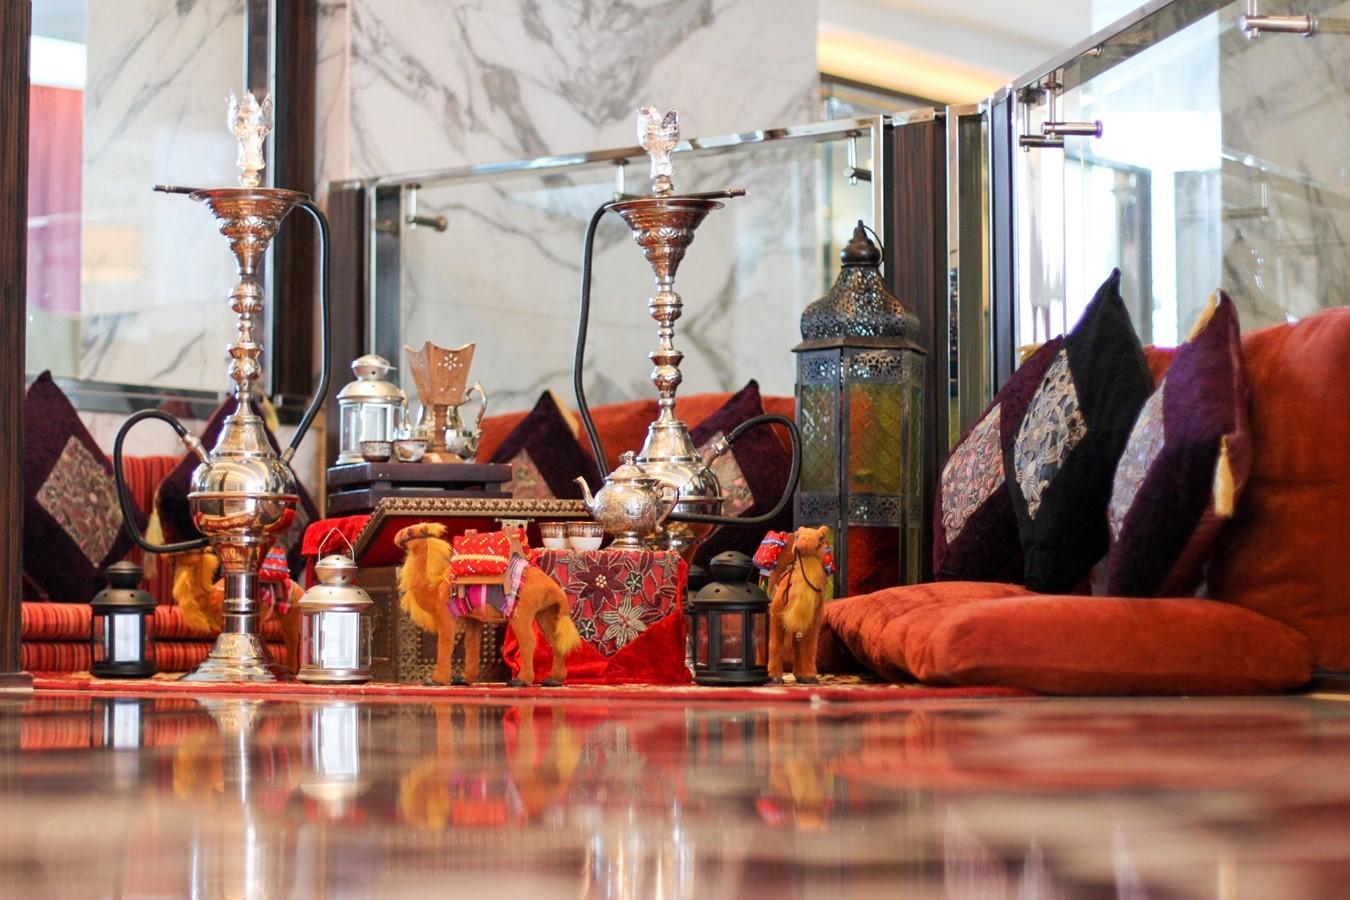 Cavendish Bonnington JLT Iftar Review Buffet Ramadan Ouzi Dessert Dubai Food Blog UAE Blogger (2)